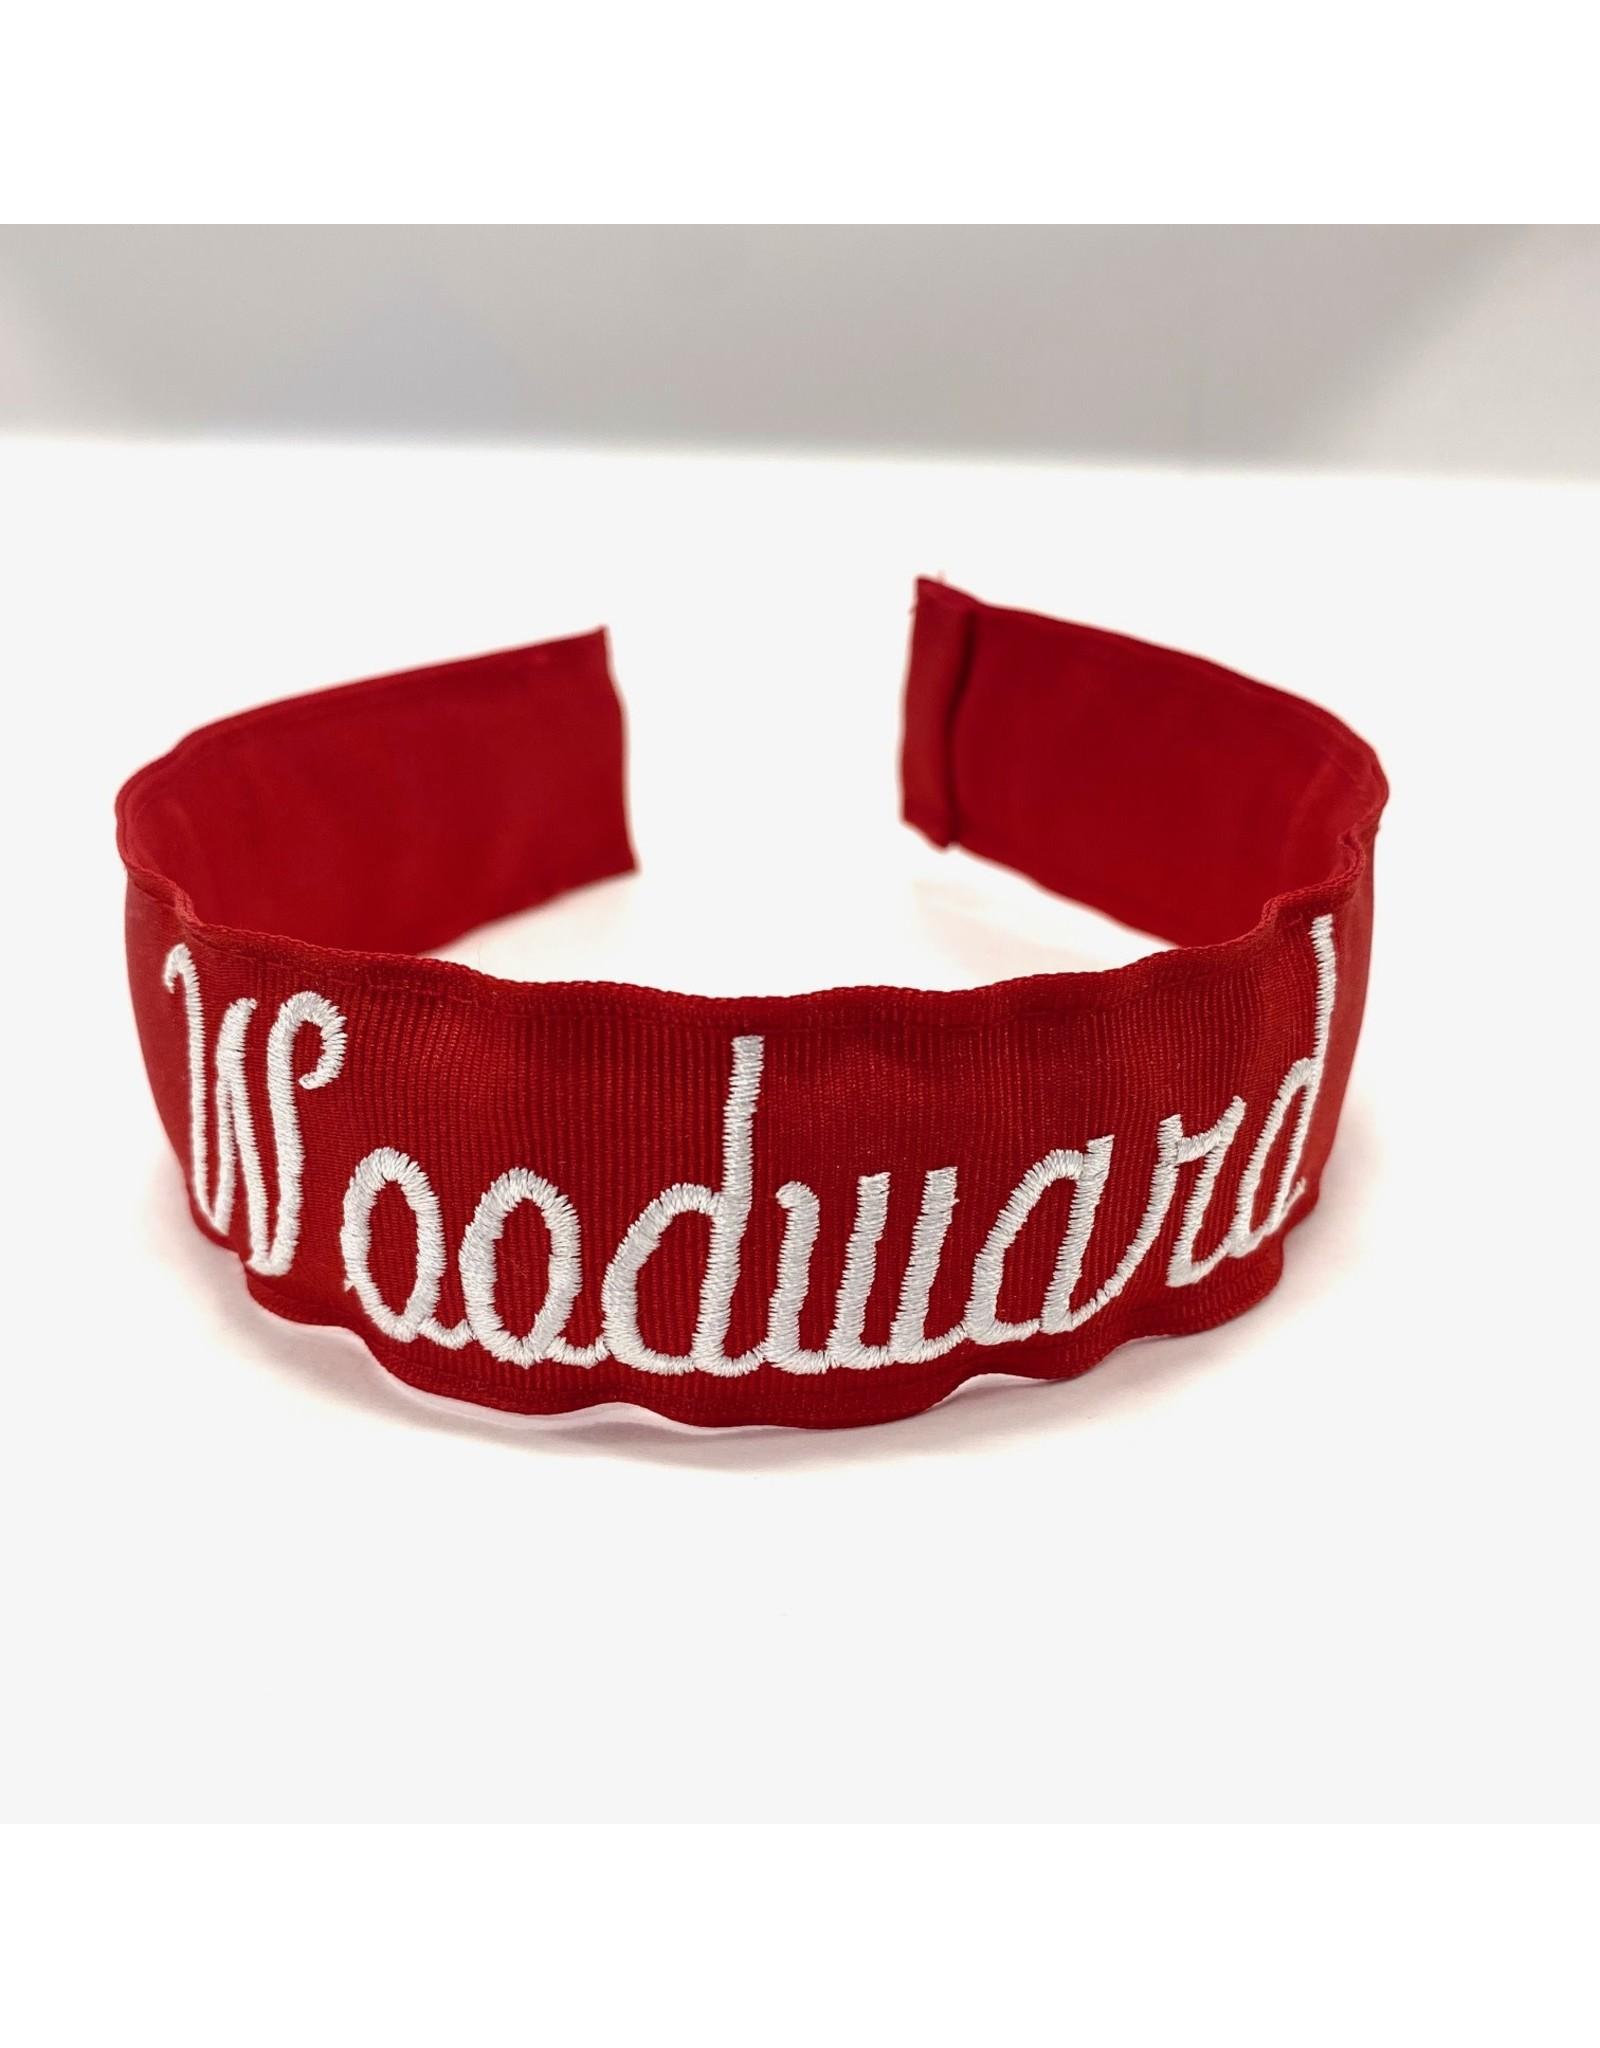 Handmade Vendor Headband -